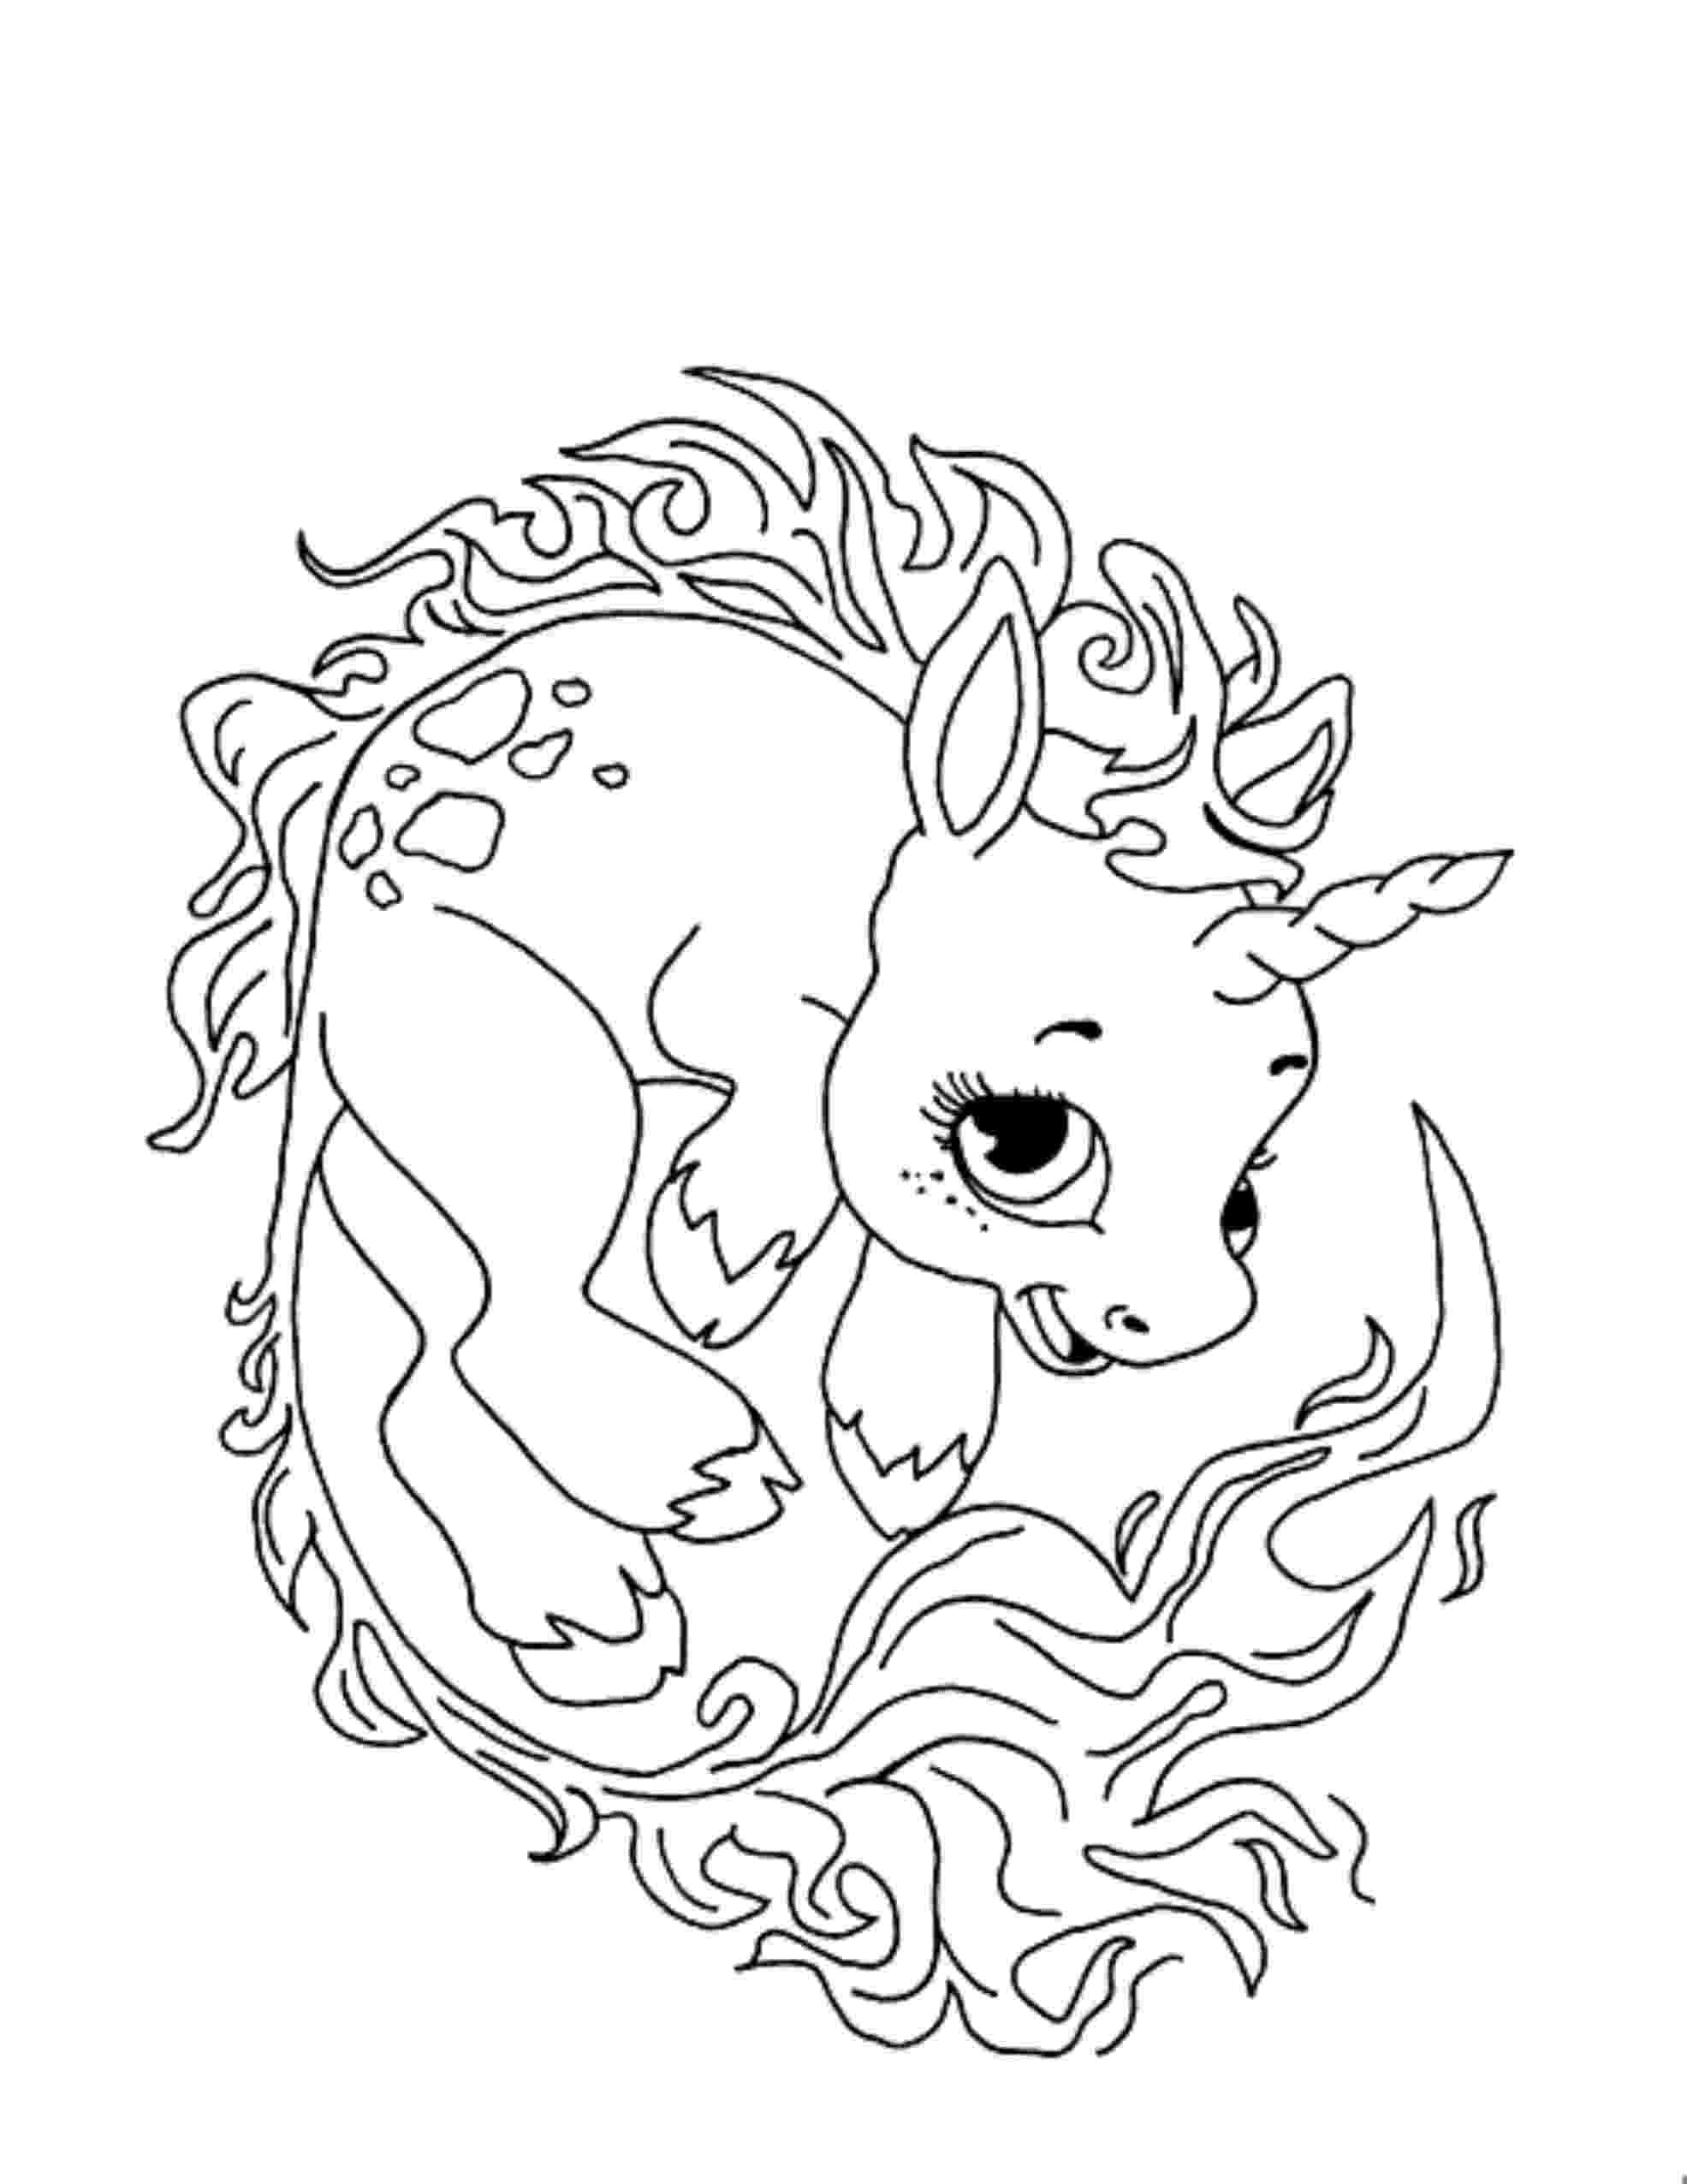 unicorn printable coloring pages downloadable unicorn colouring page michael o39mara books unicorn coloring printable pages